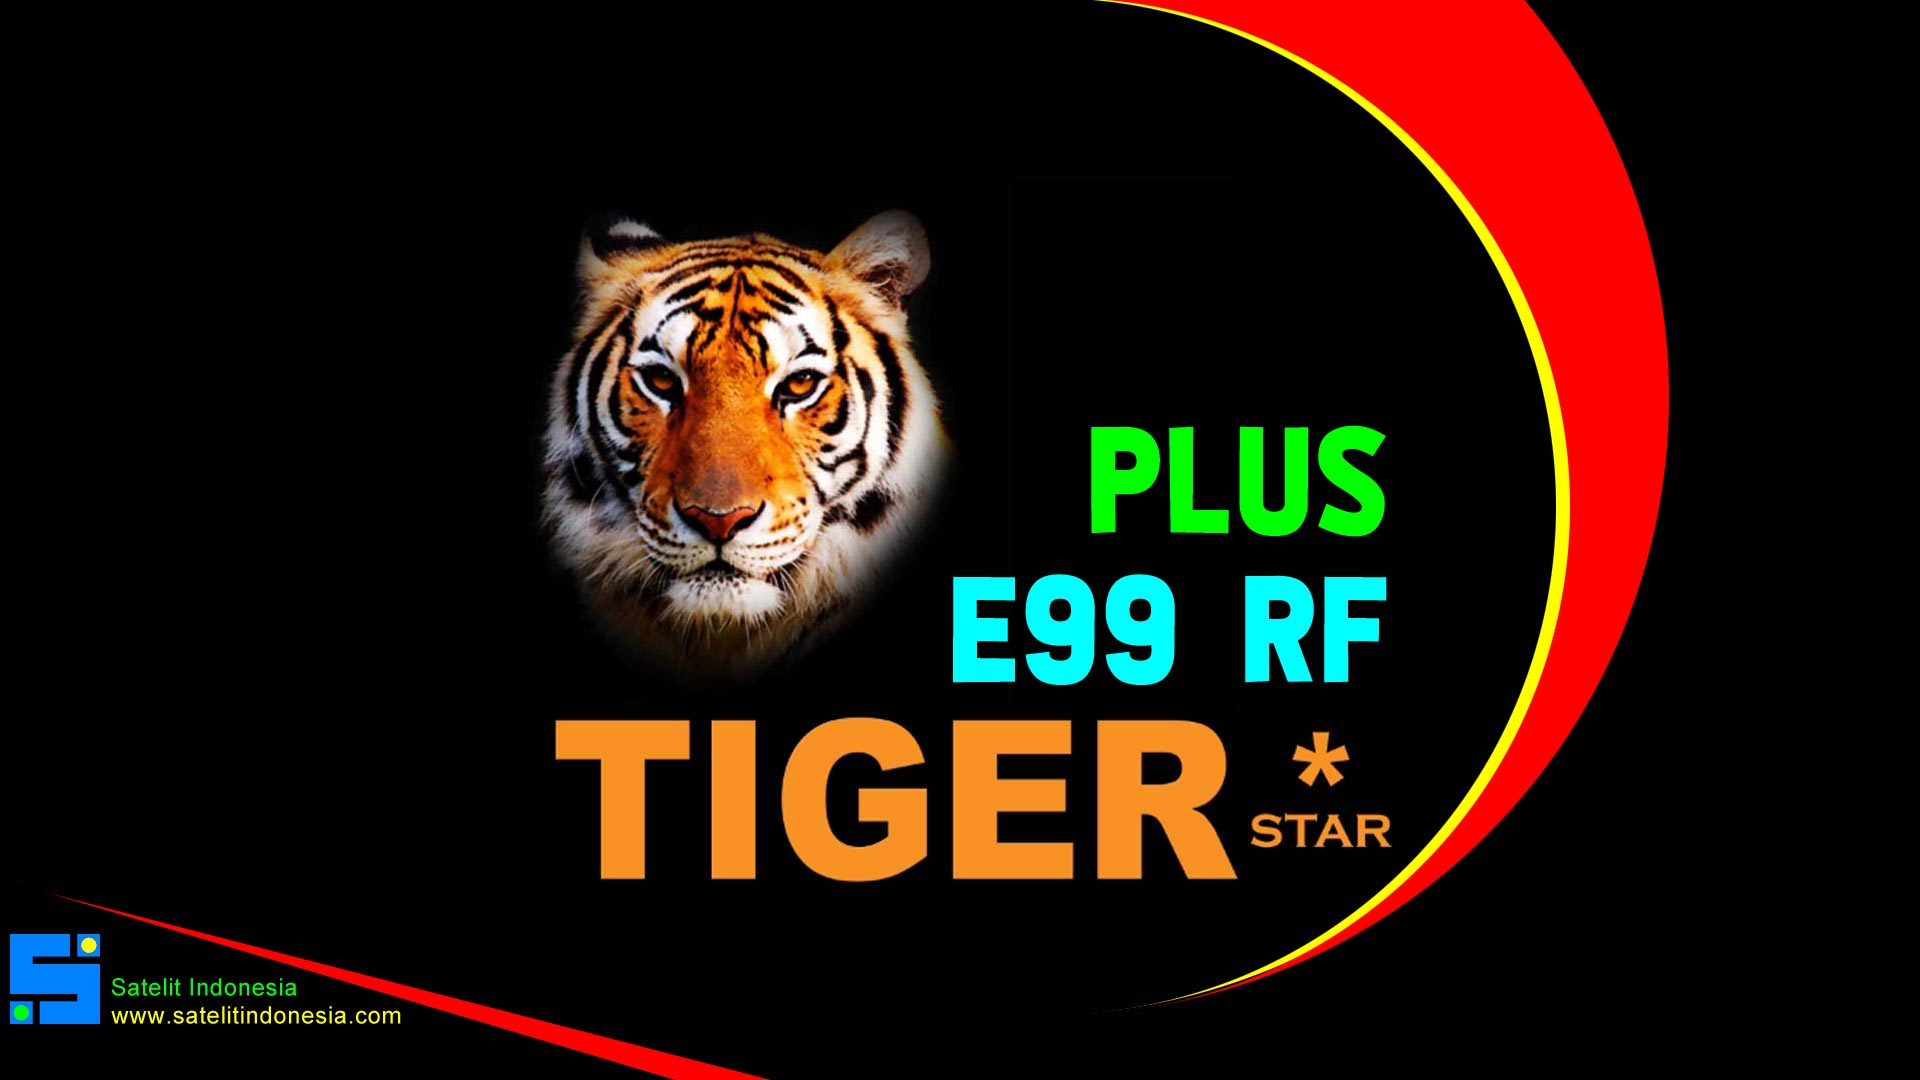 Software Tiger Star E99 Plus RF Update Firmware Receiver